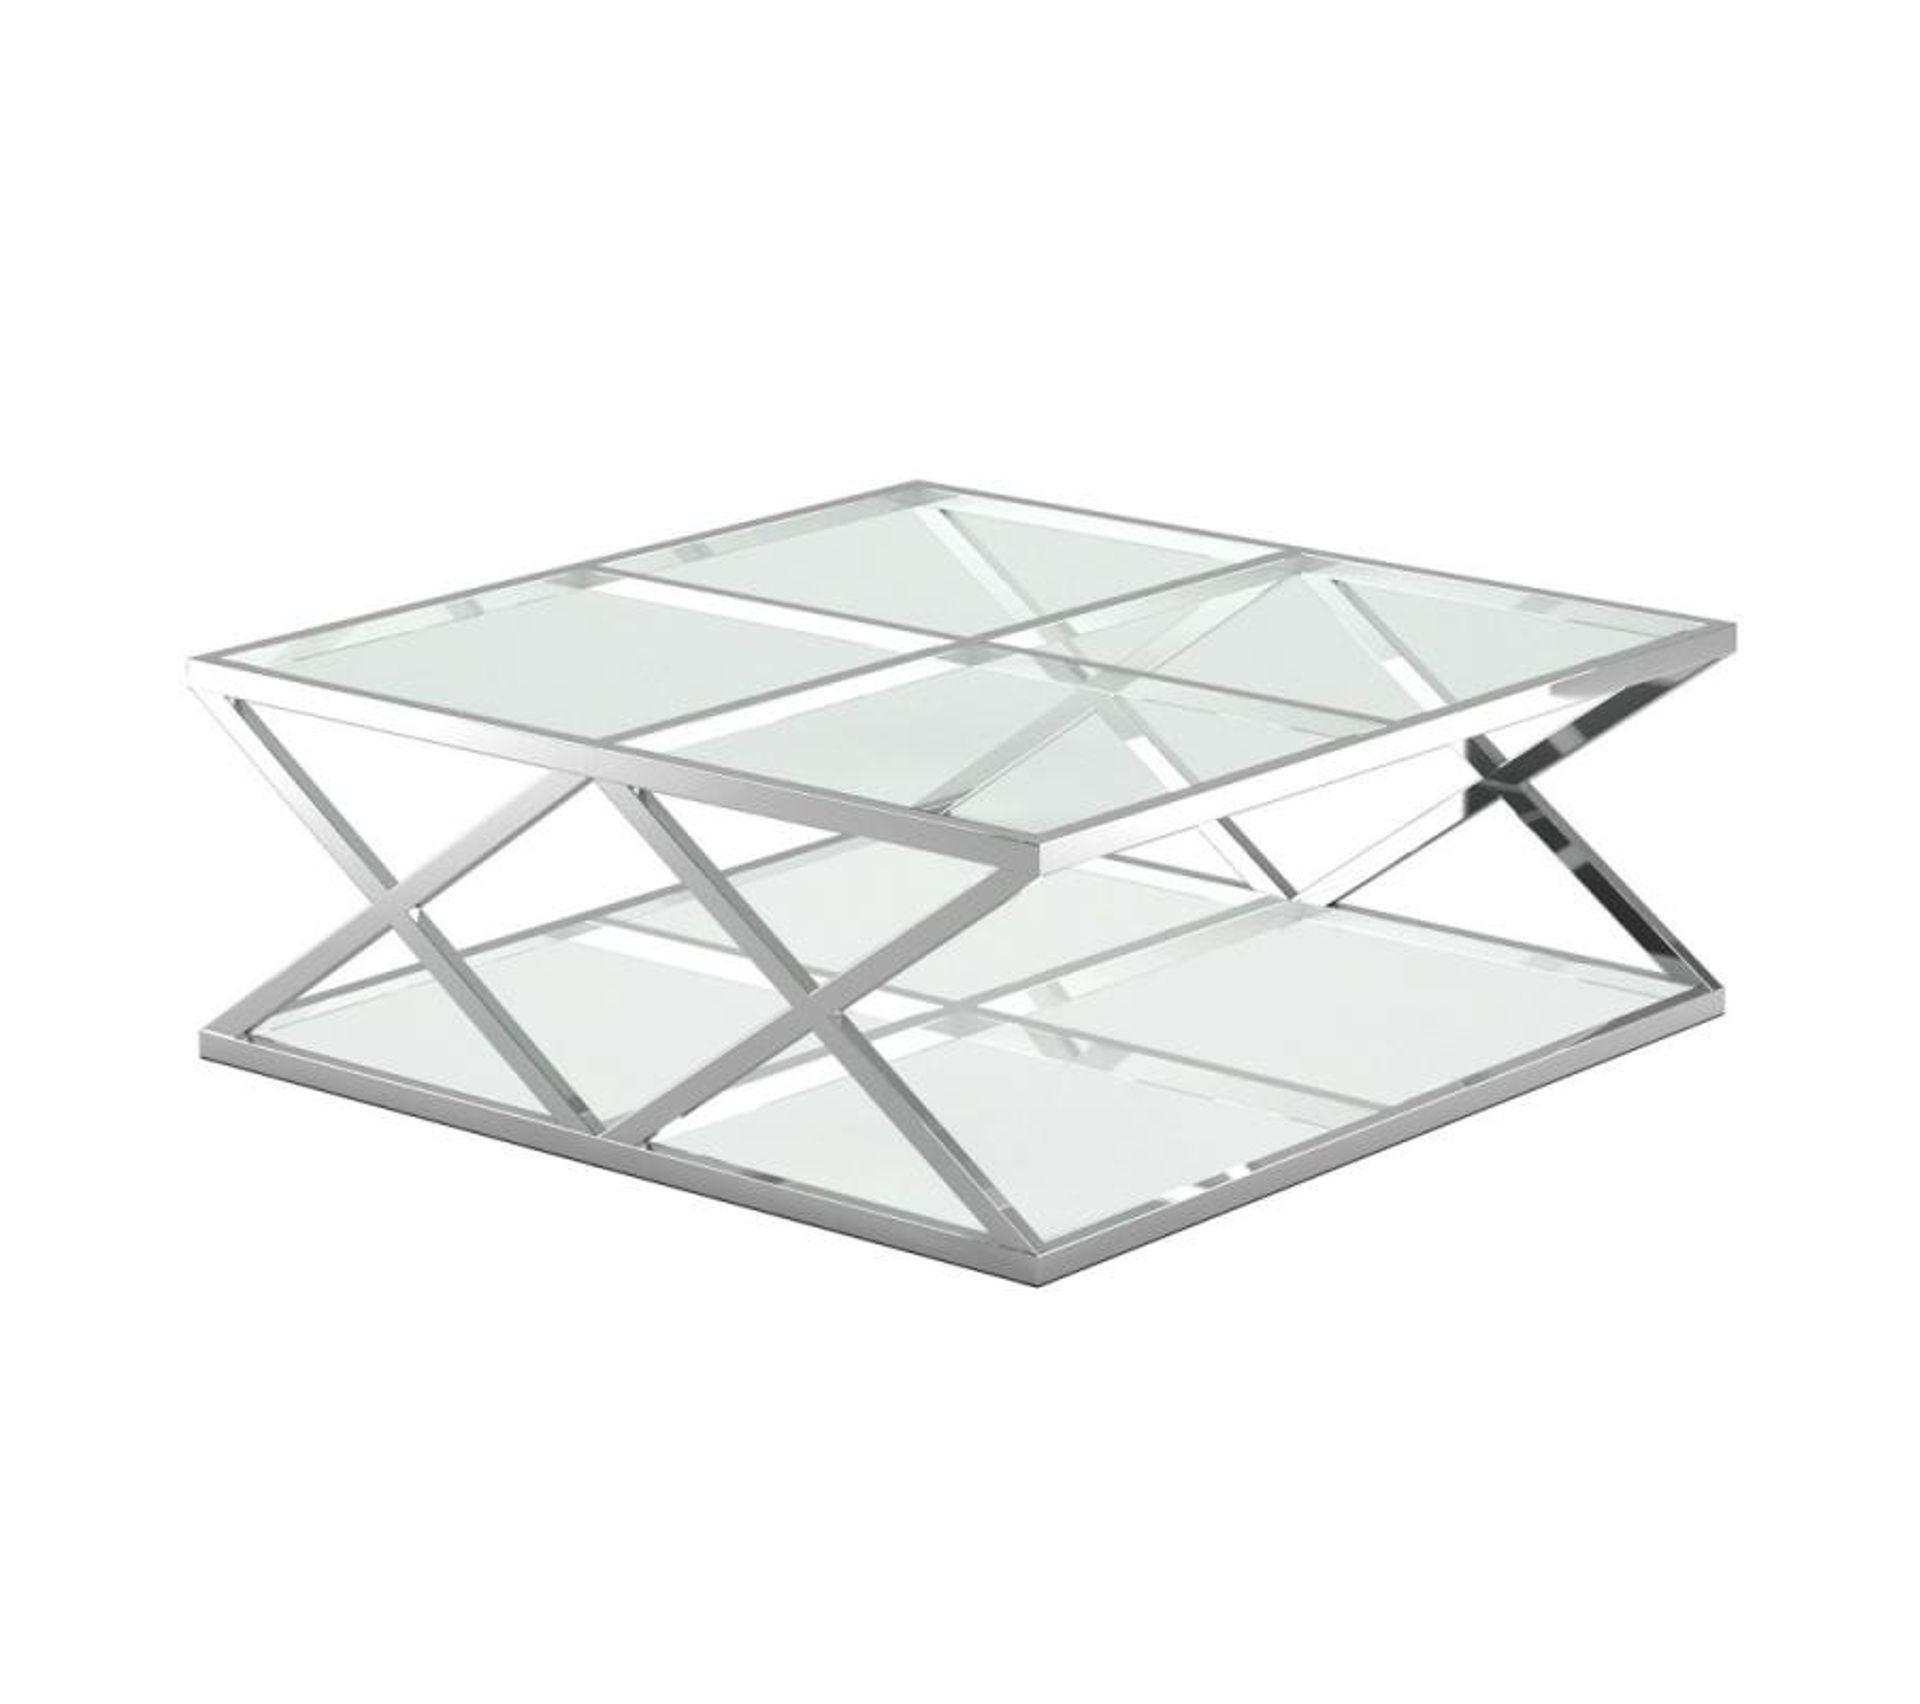 Table Basse Carree Verre Metal Zamani N 1 Table Basse But